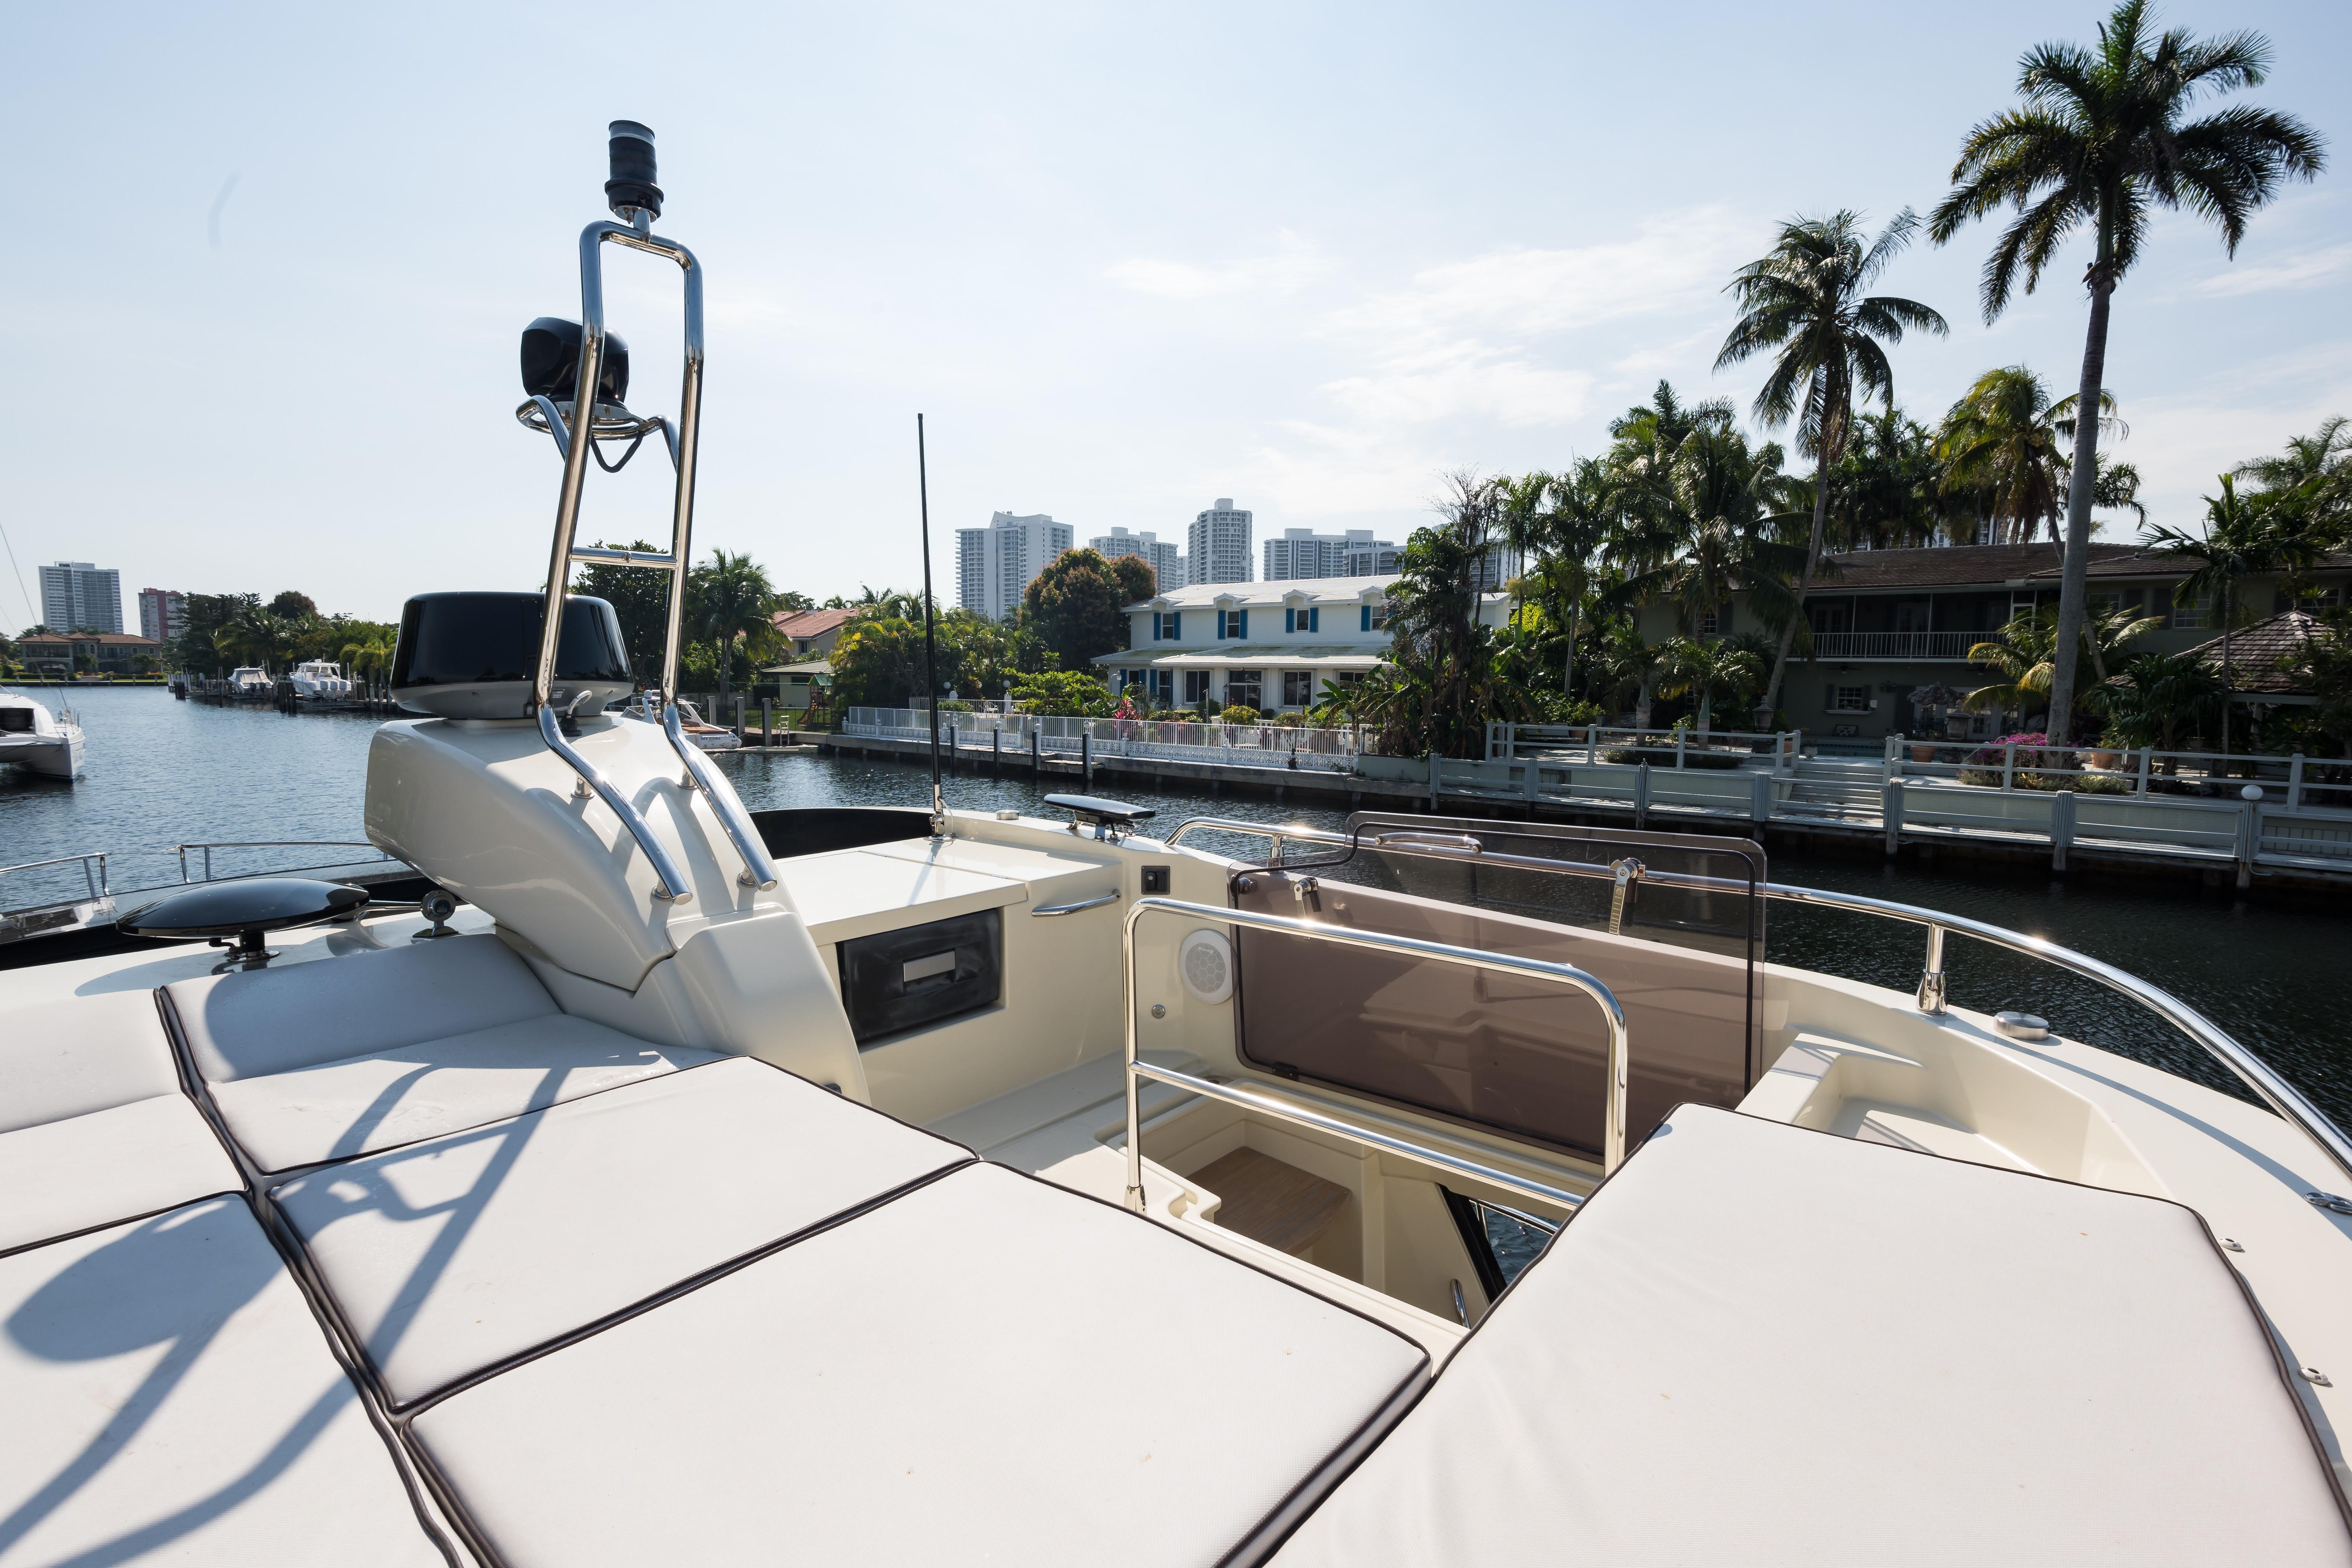 2015 Beneteau Monte Carlo 5S Hardtop Lounge